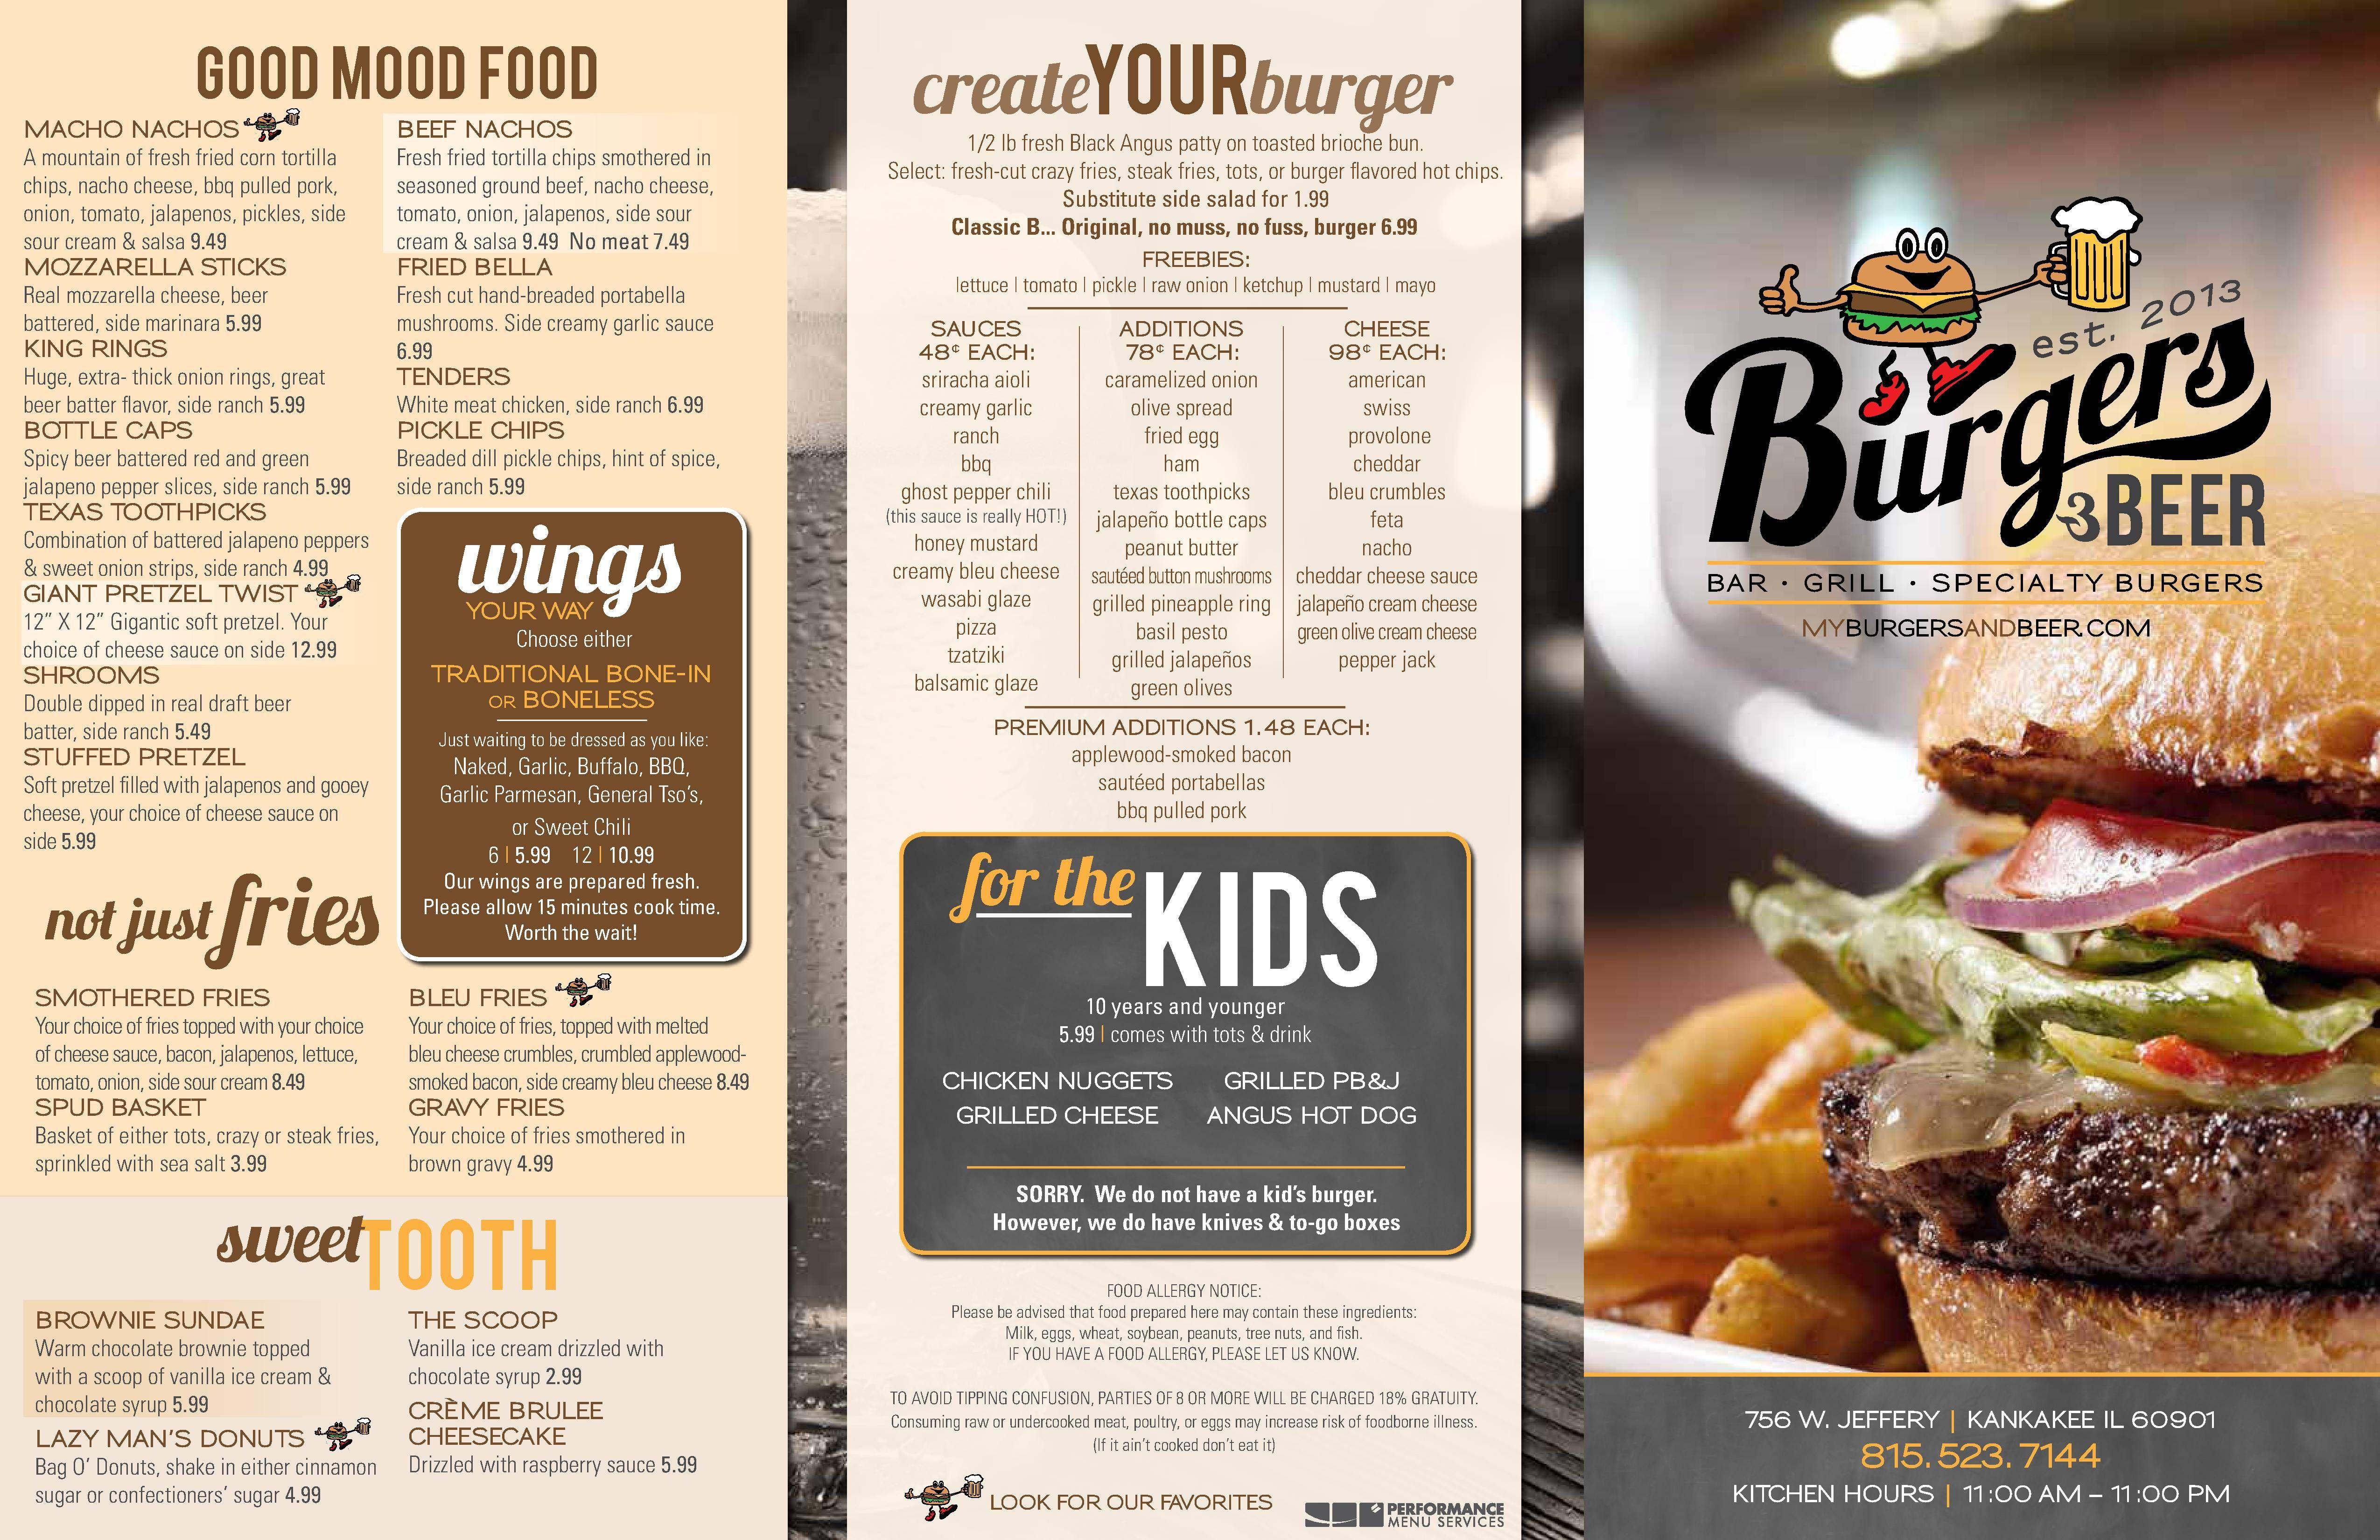 Burgers And Beer Nachos Beef Eat Good Food